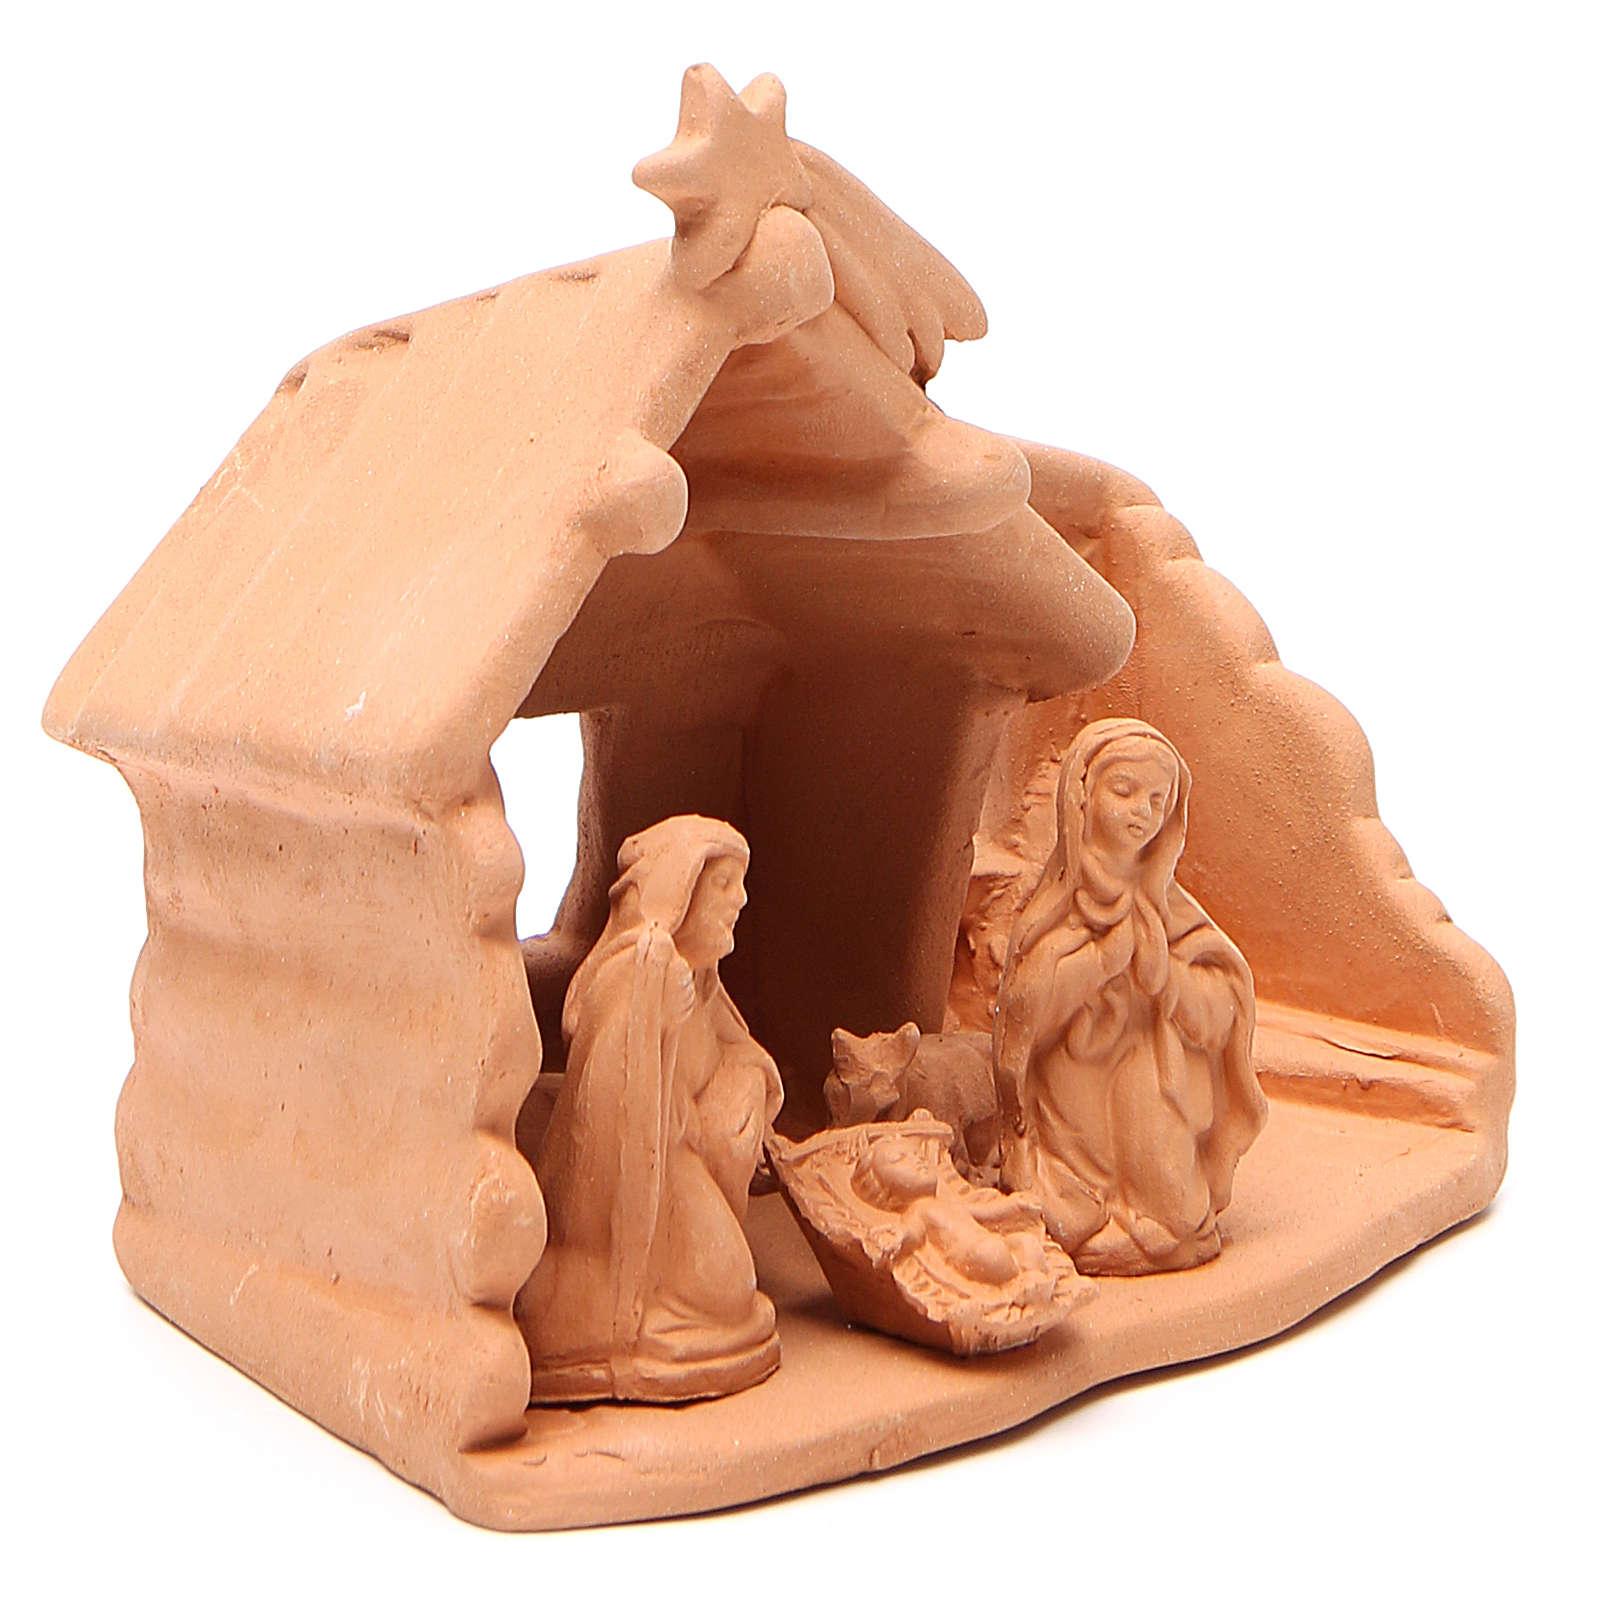 Natività con Capanna in terracotta naturale h. 15x16x9 cm 4